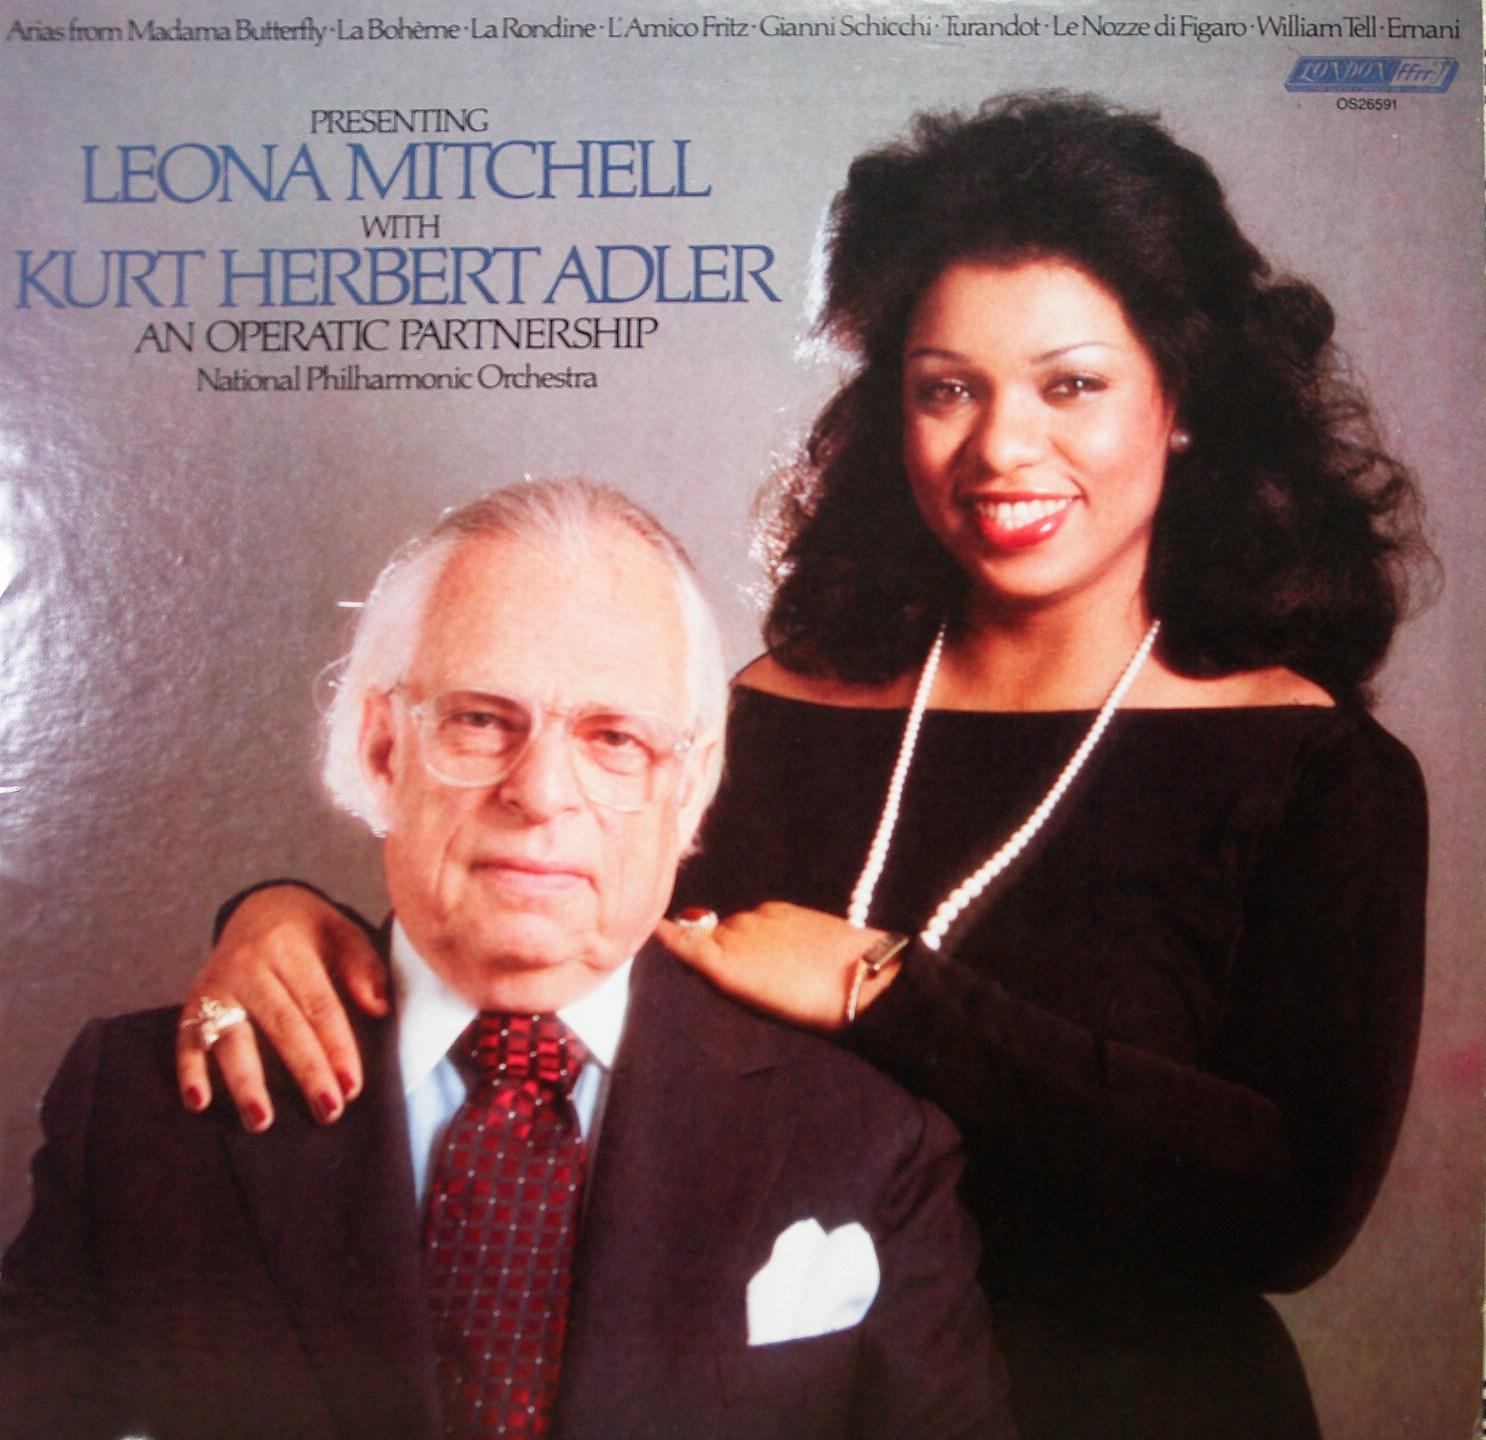 Presenting: Leona Mitchell with Kurt Herbert Adler: An Operatic Partnership